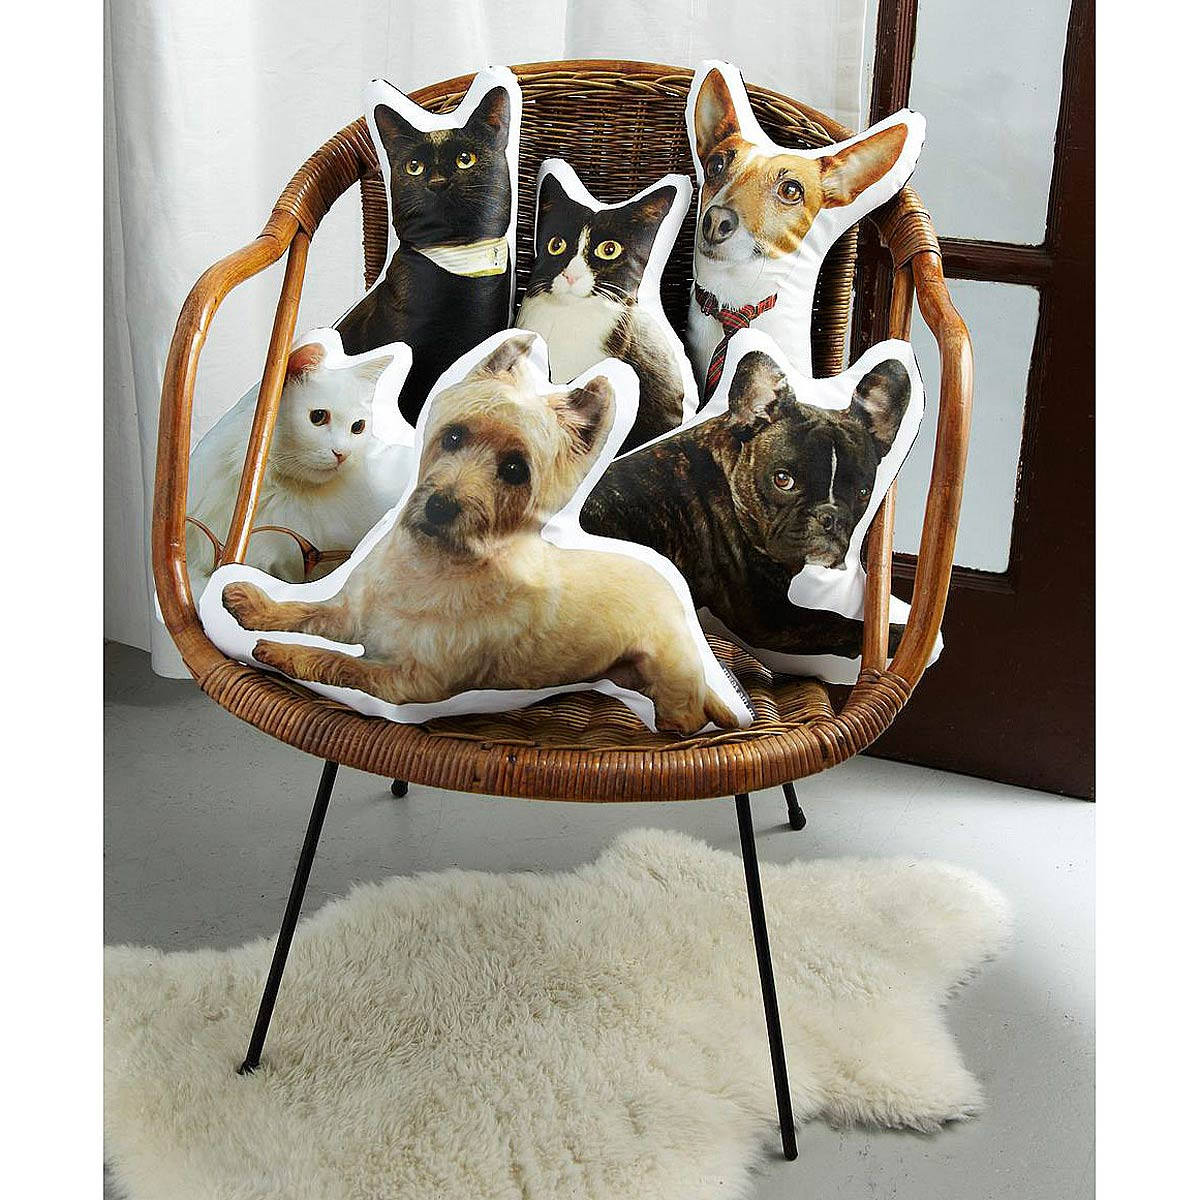 c53fc89ee3d9 Them.gifts - Custom Pet Pillow